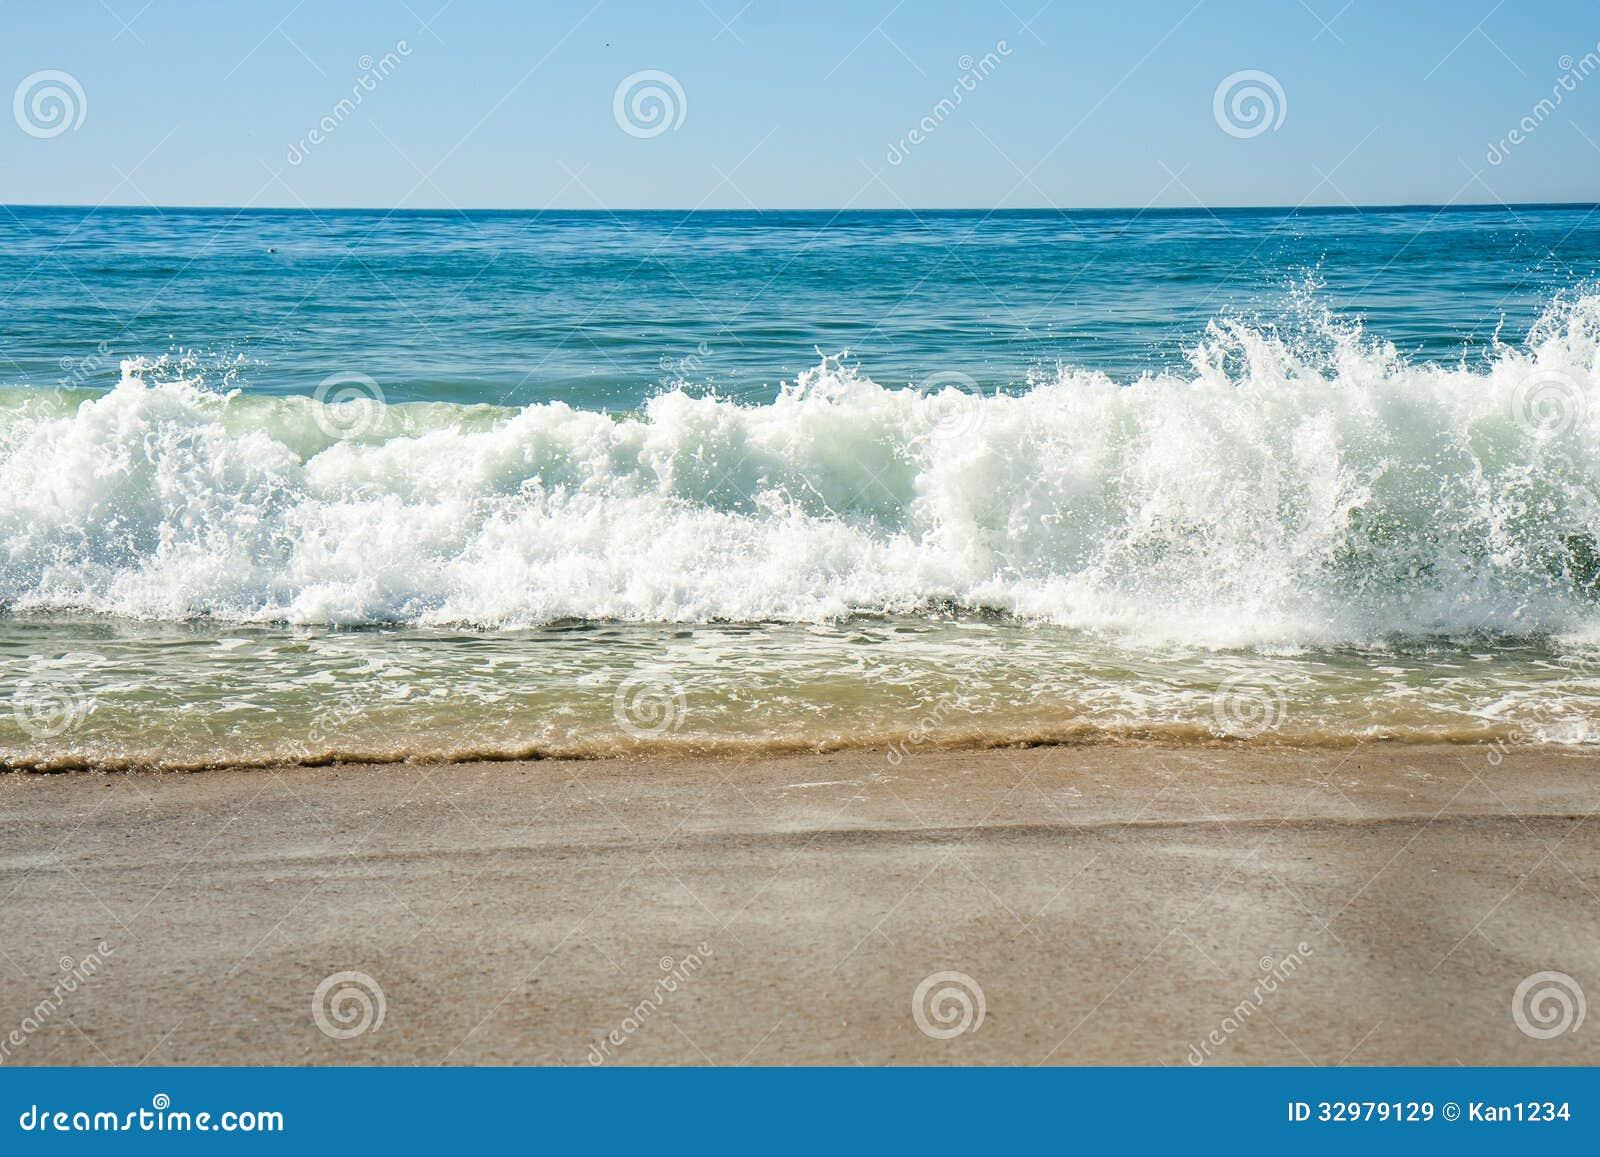 Laguna Beach-Welle